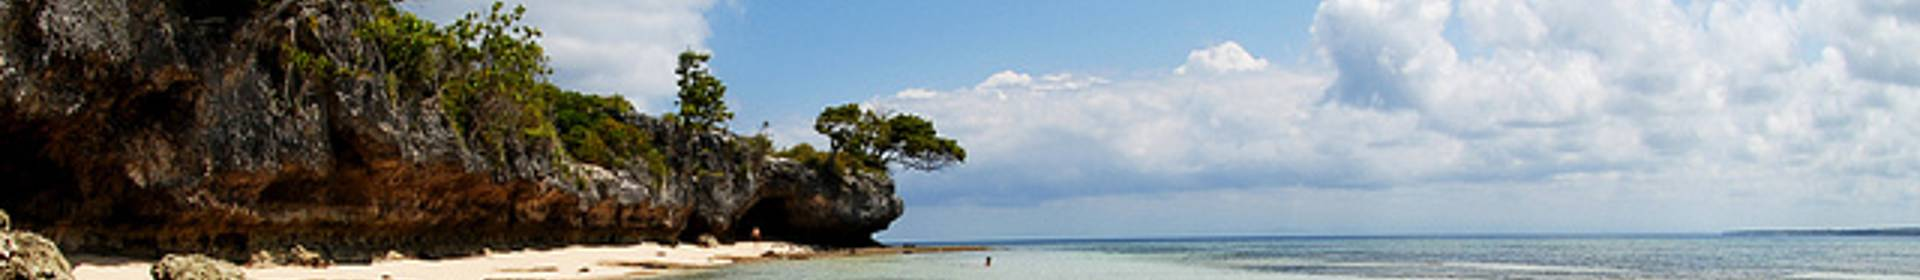 île de Liukan